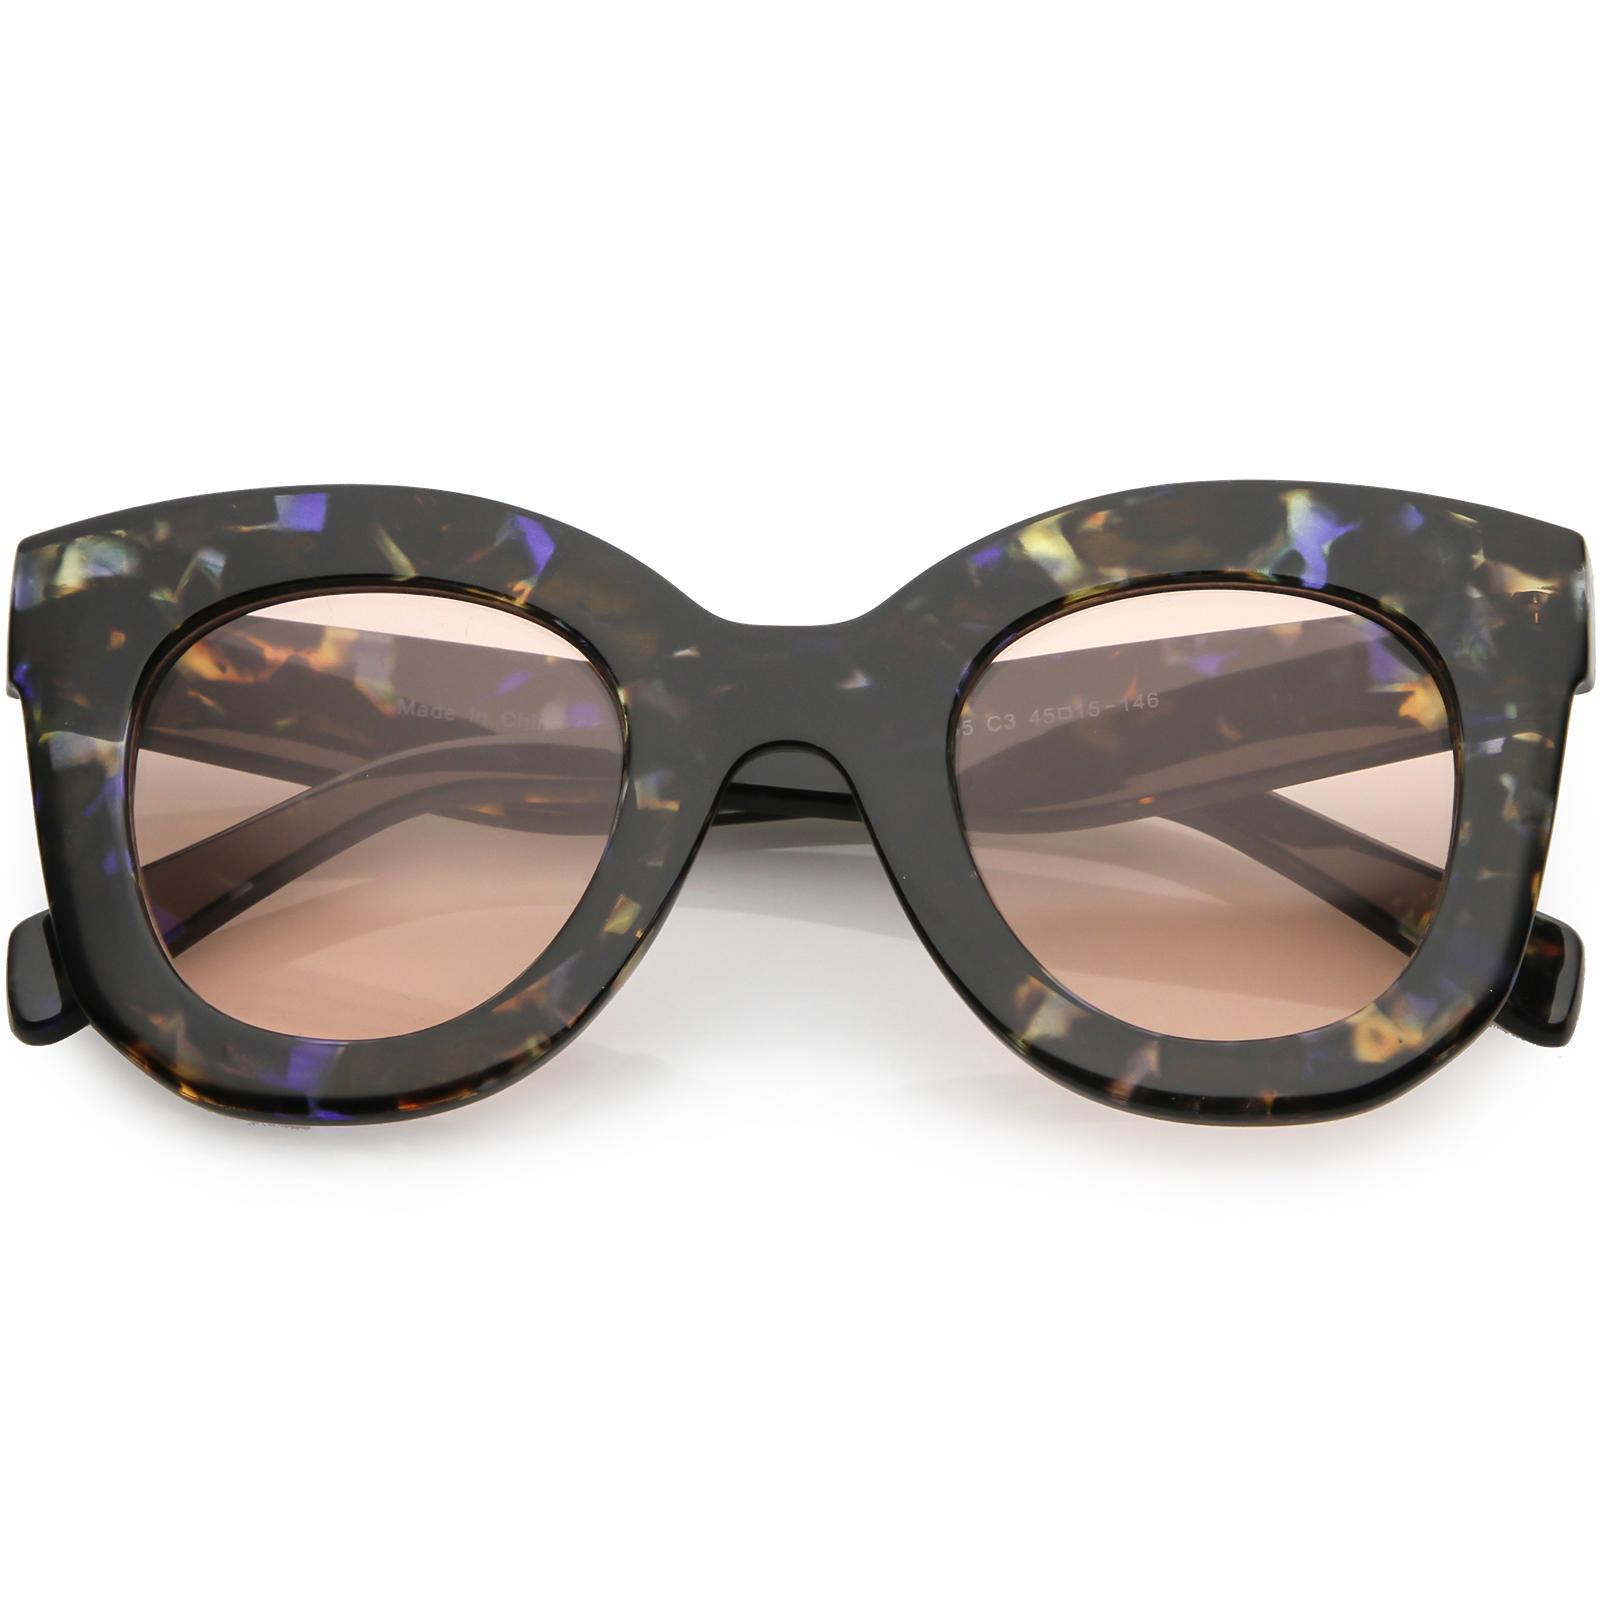 sunglassLA - Women's Oversize Chunky Cat Eye Sunglasses Round Lens 46mm - 46mm